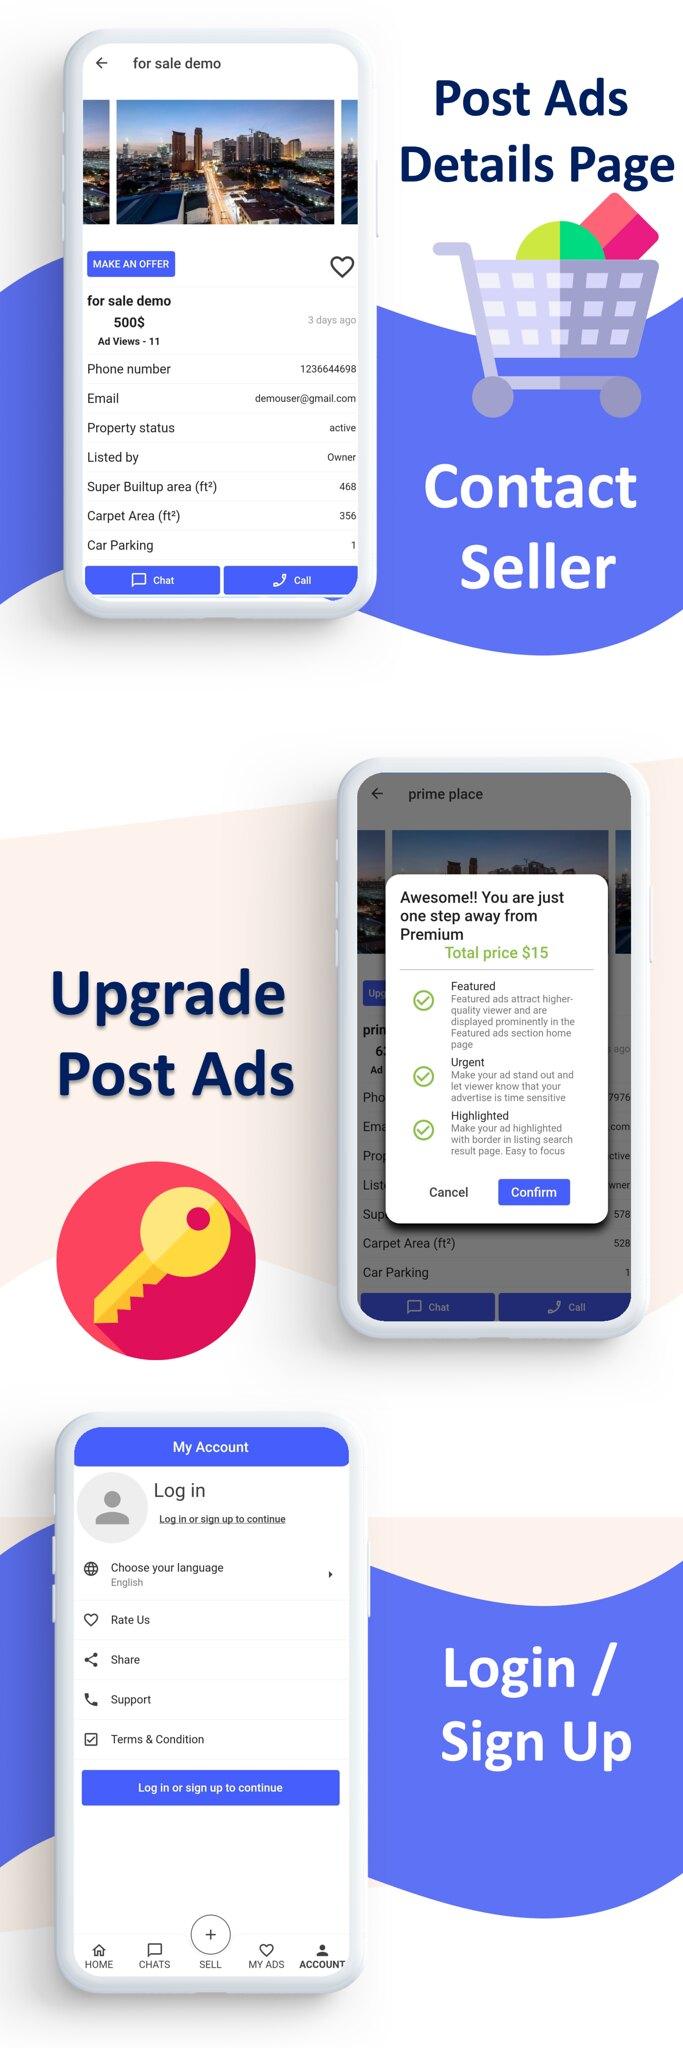 Mark Classified App    App classificado    Gateways de múltiplos pagamentos integrados    Compra e Venda    Assinatura - 6